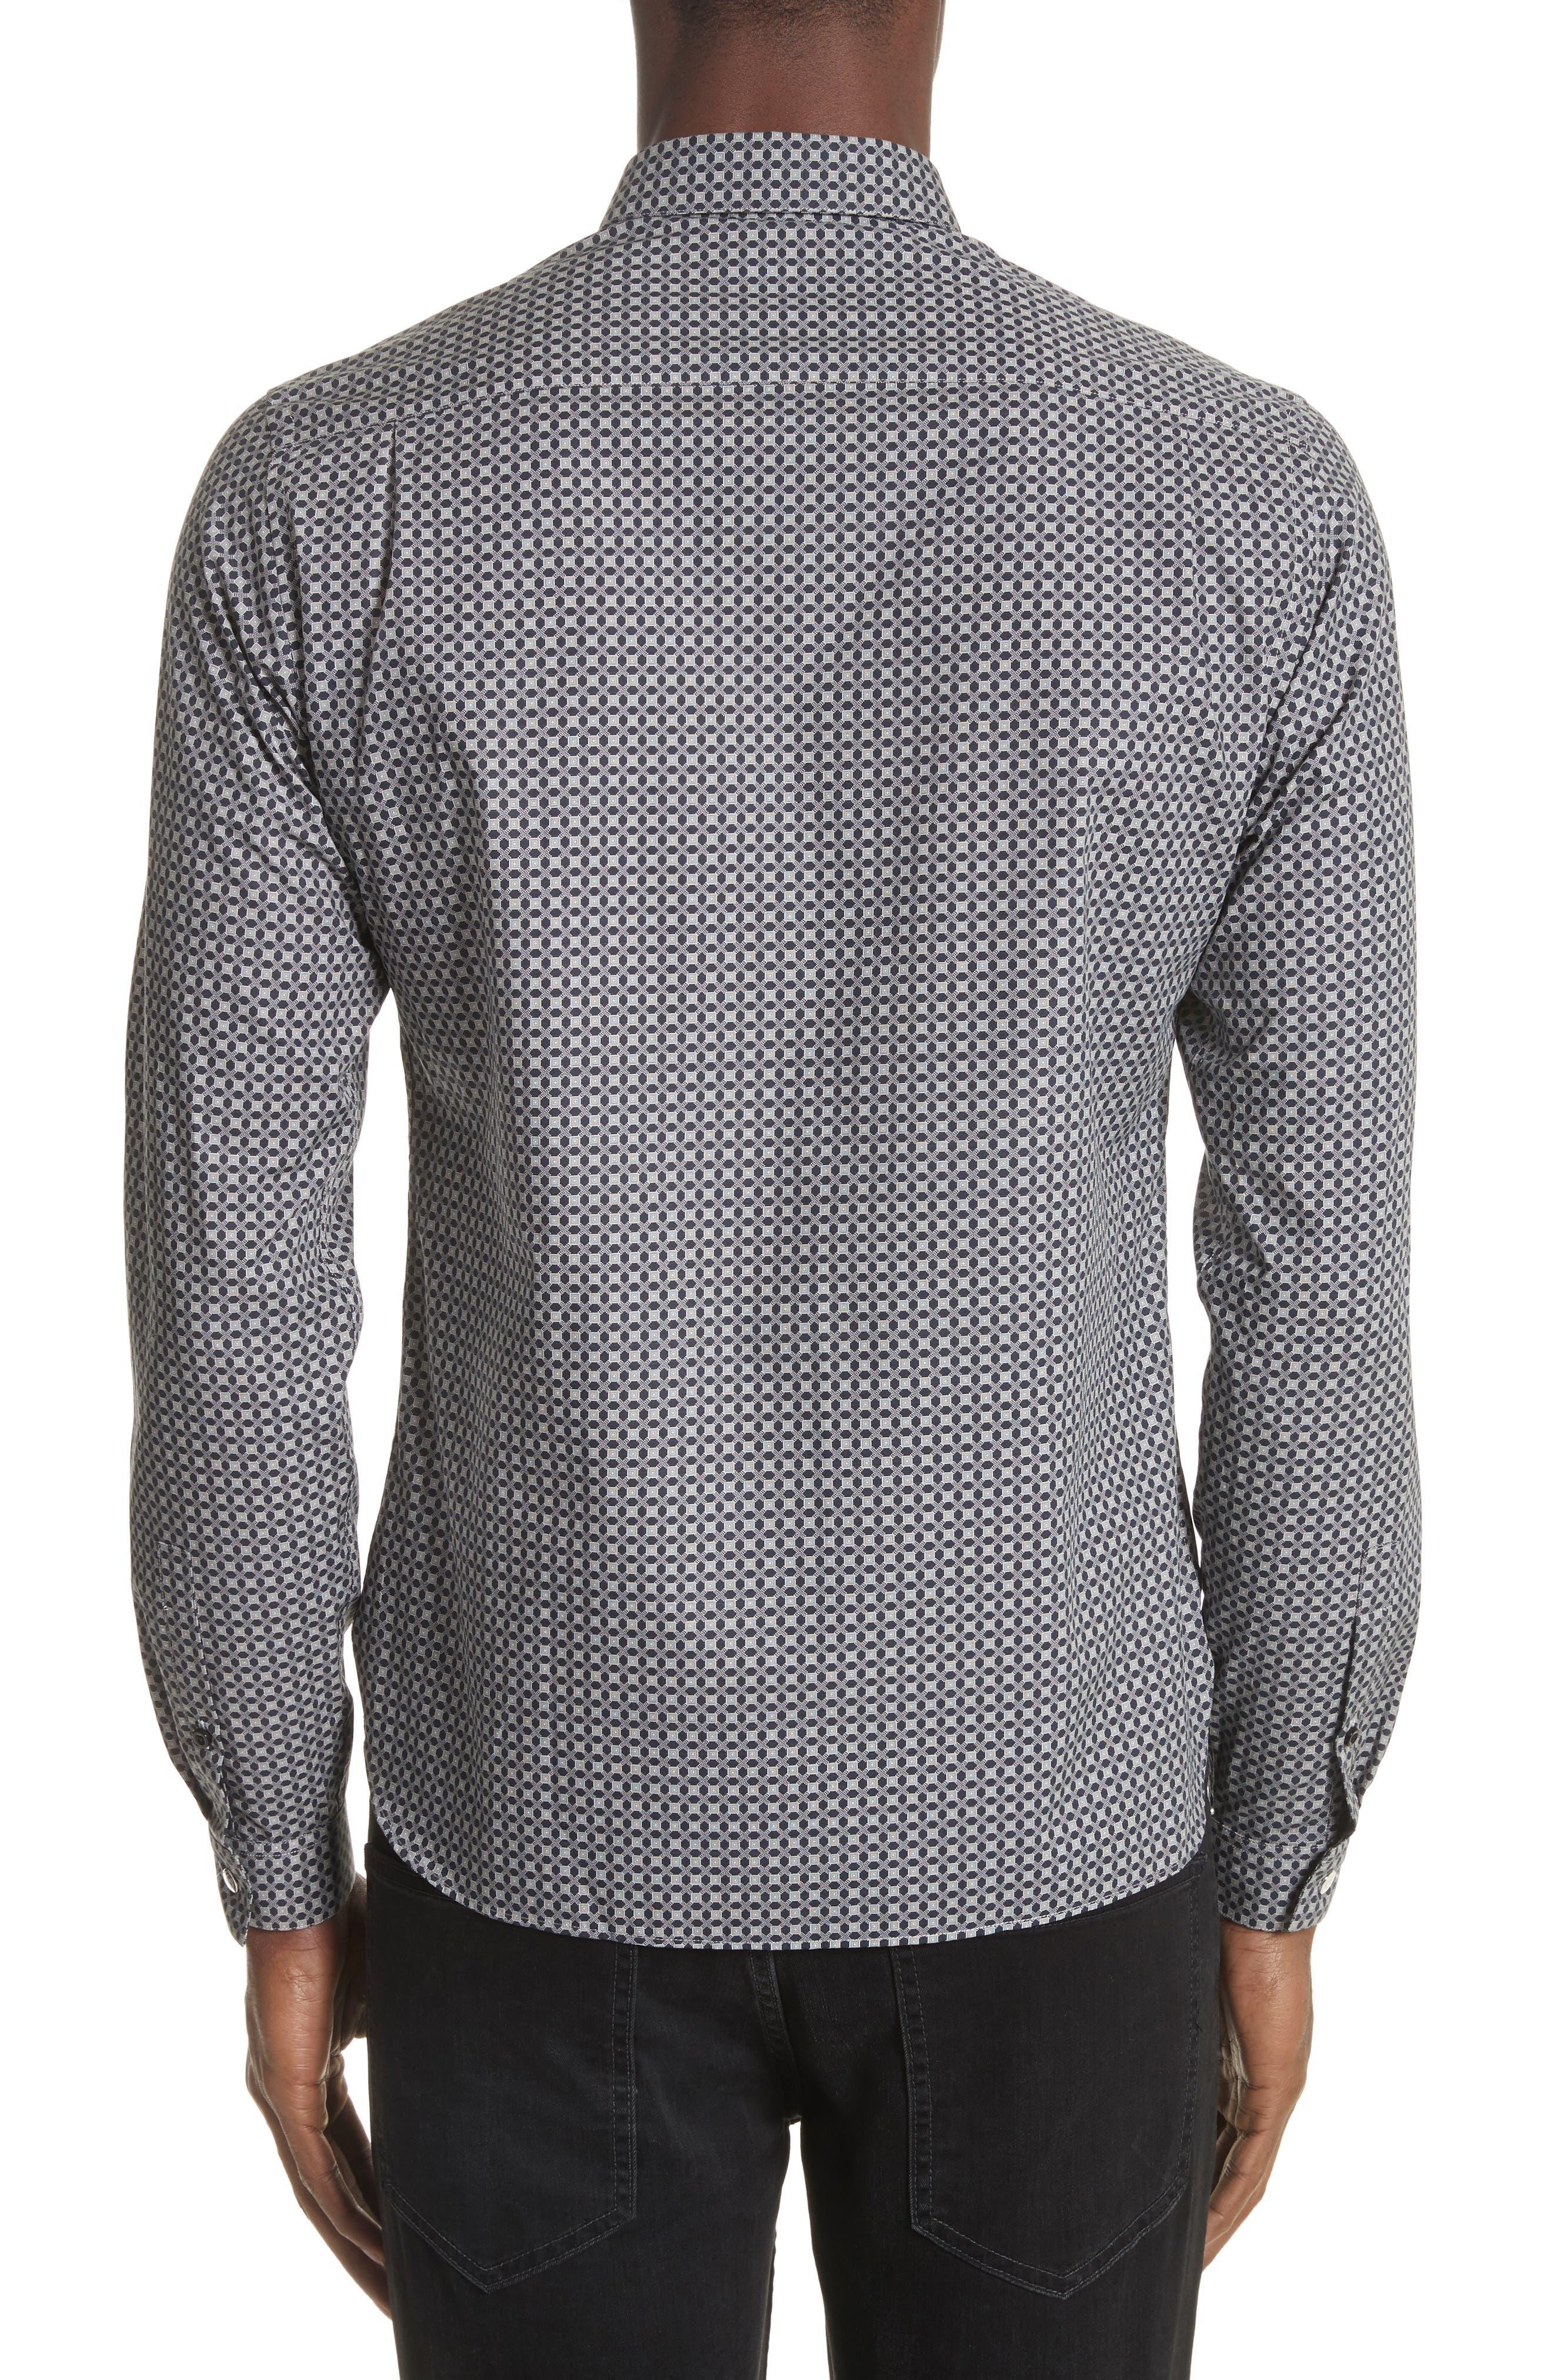 Alternate Image 2  - The Kooples Geometric Print Woven Shirt